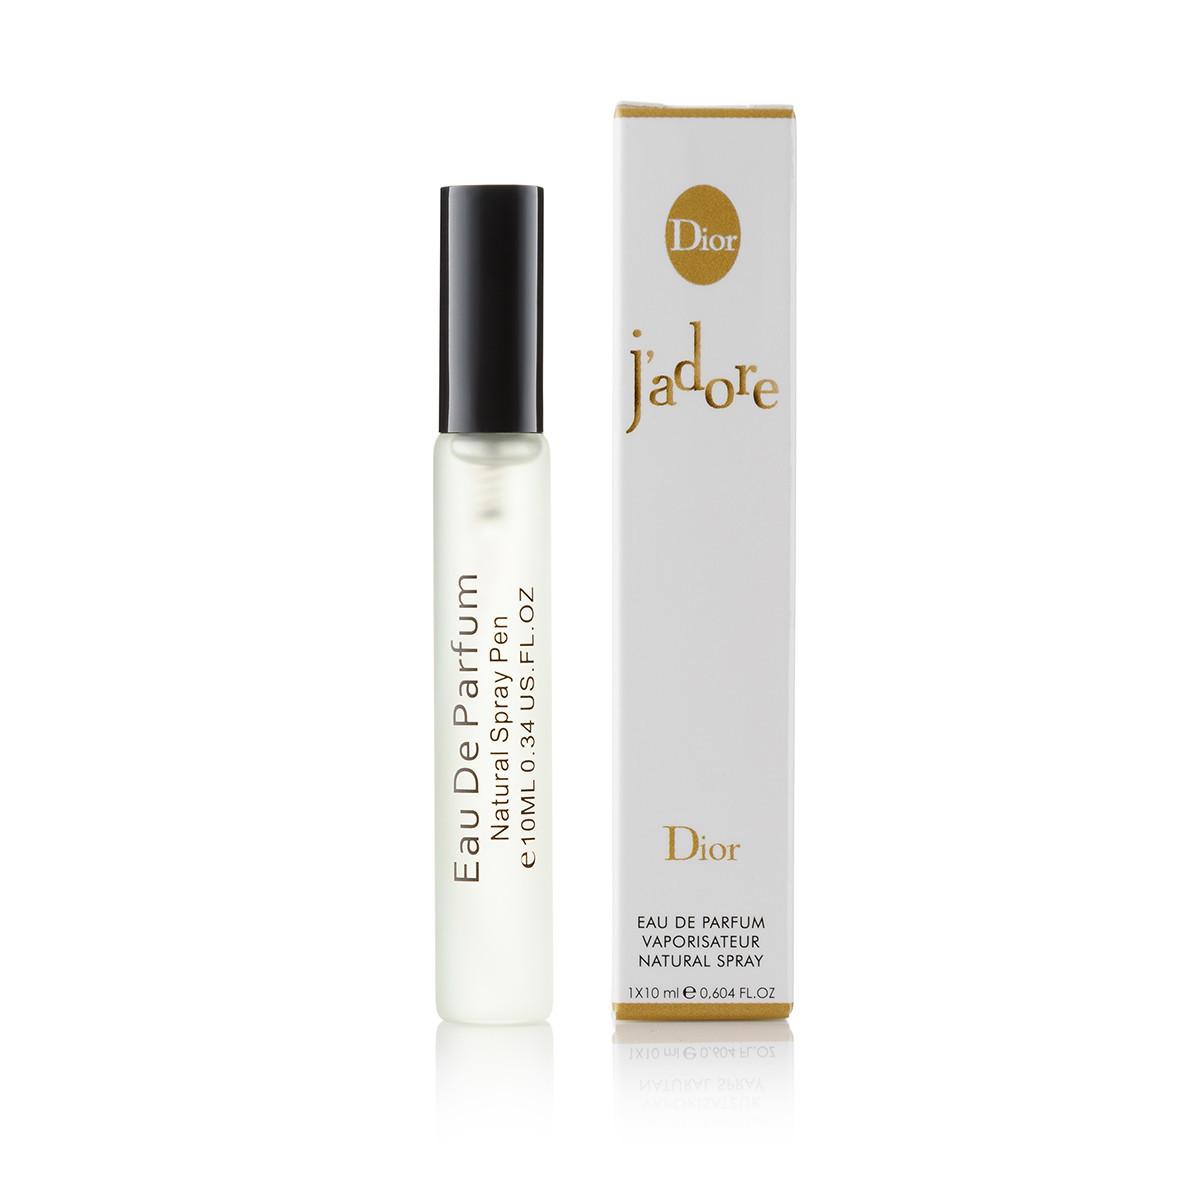 10 мл міні парфум спрей в ручці Jadore (Ж) Д-21